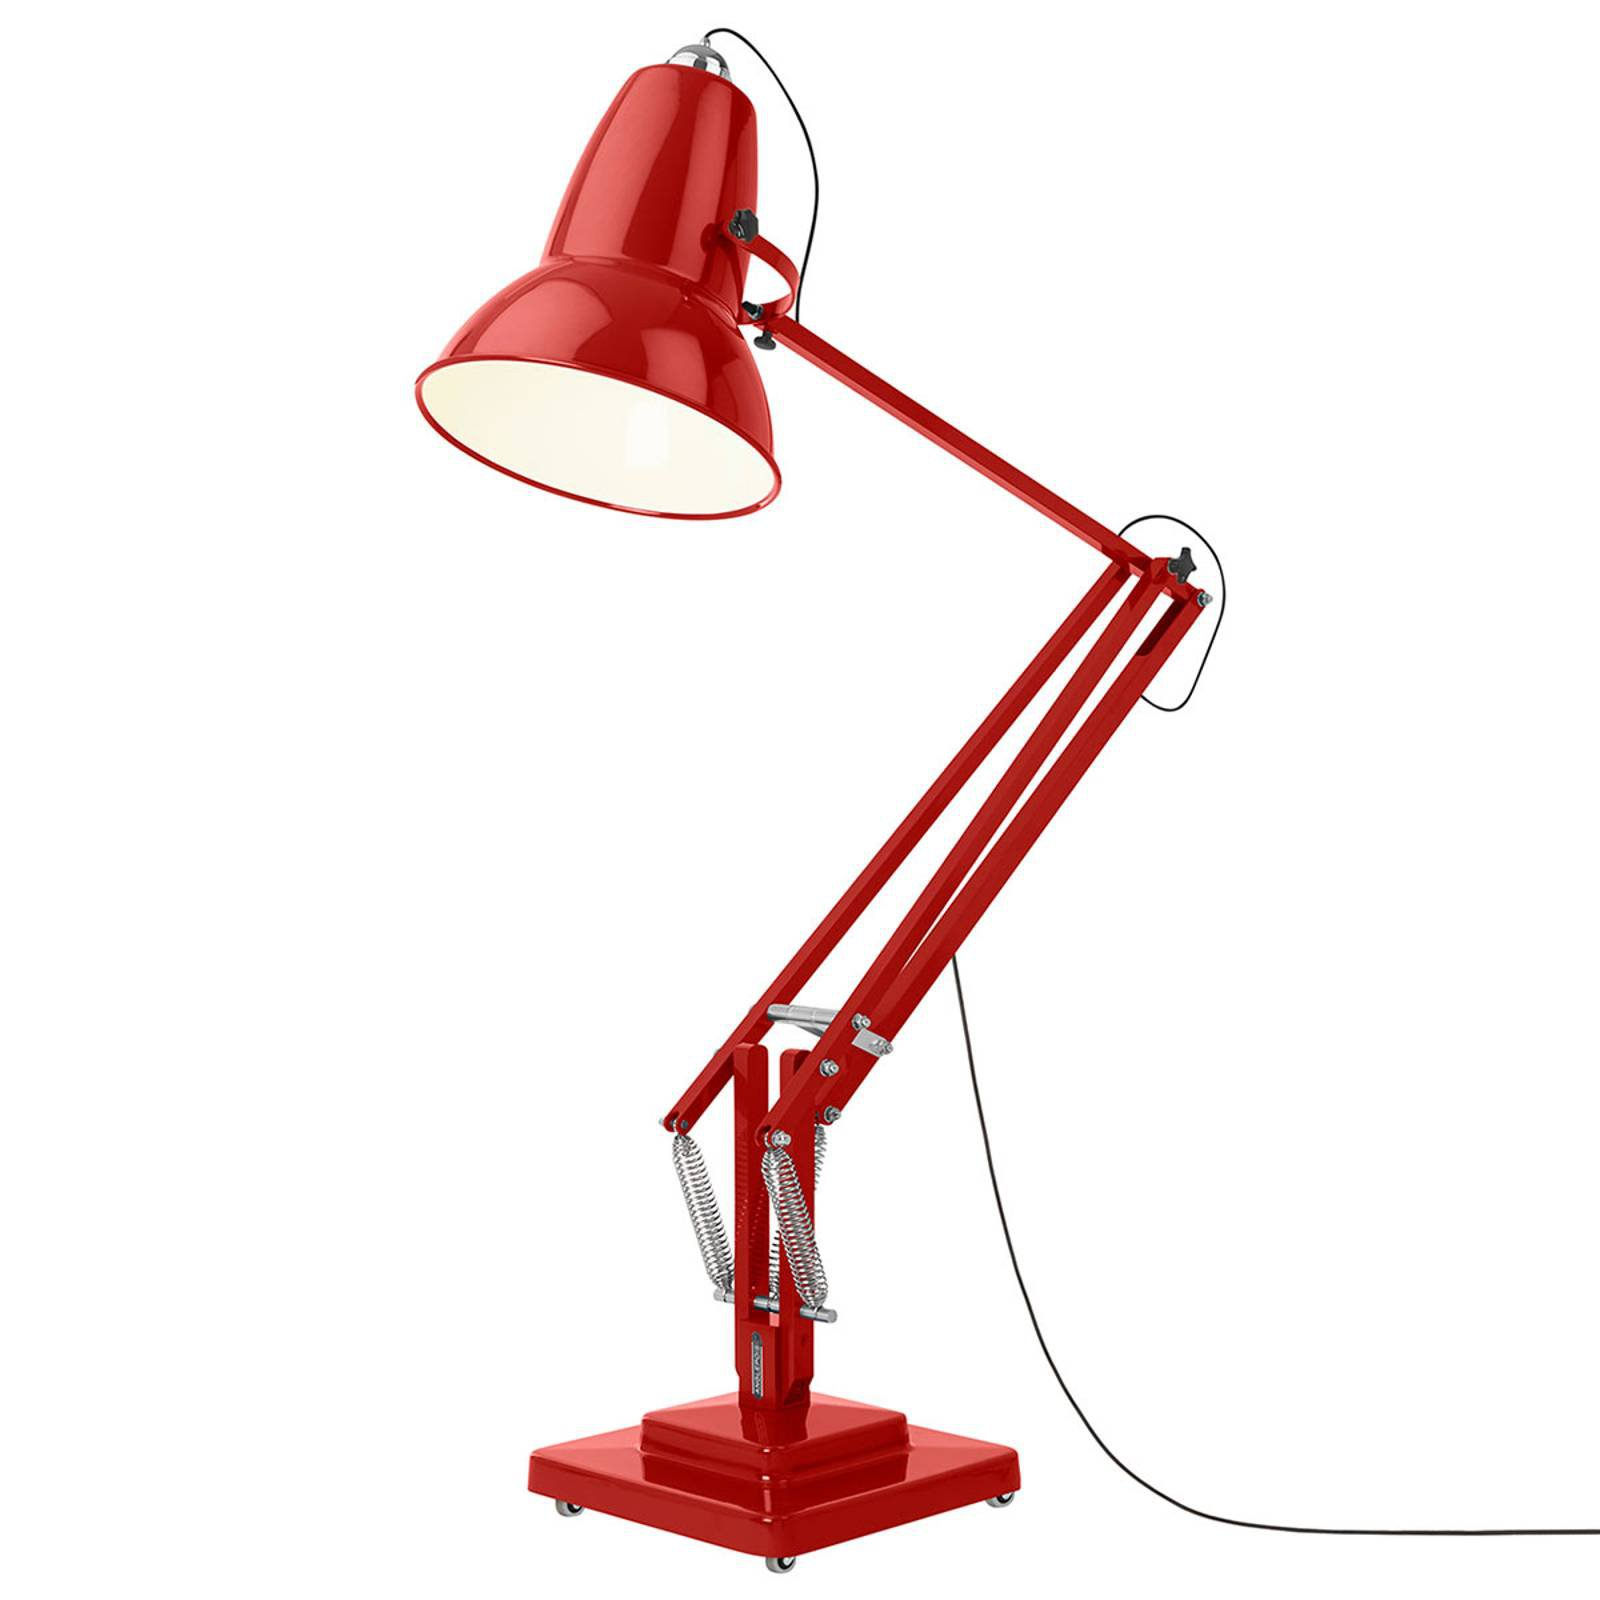 Anglepoise Original 1227 Giant gulvlampe rød